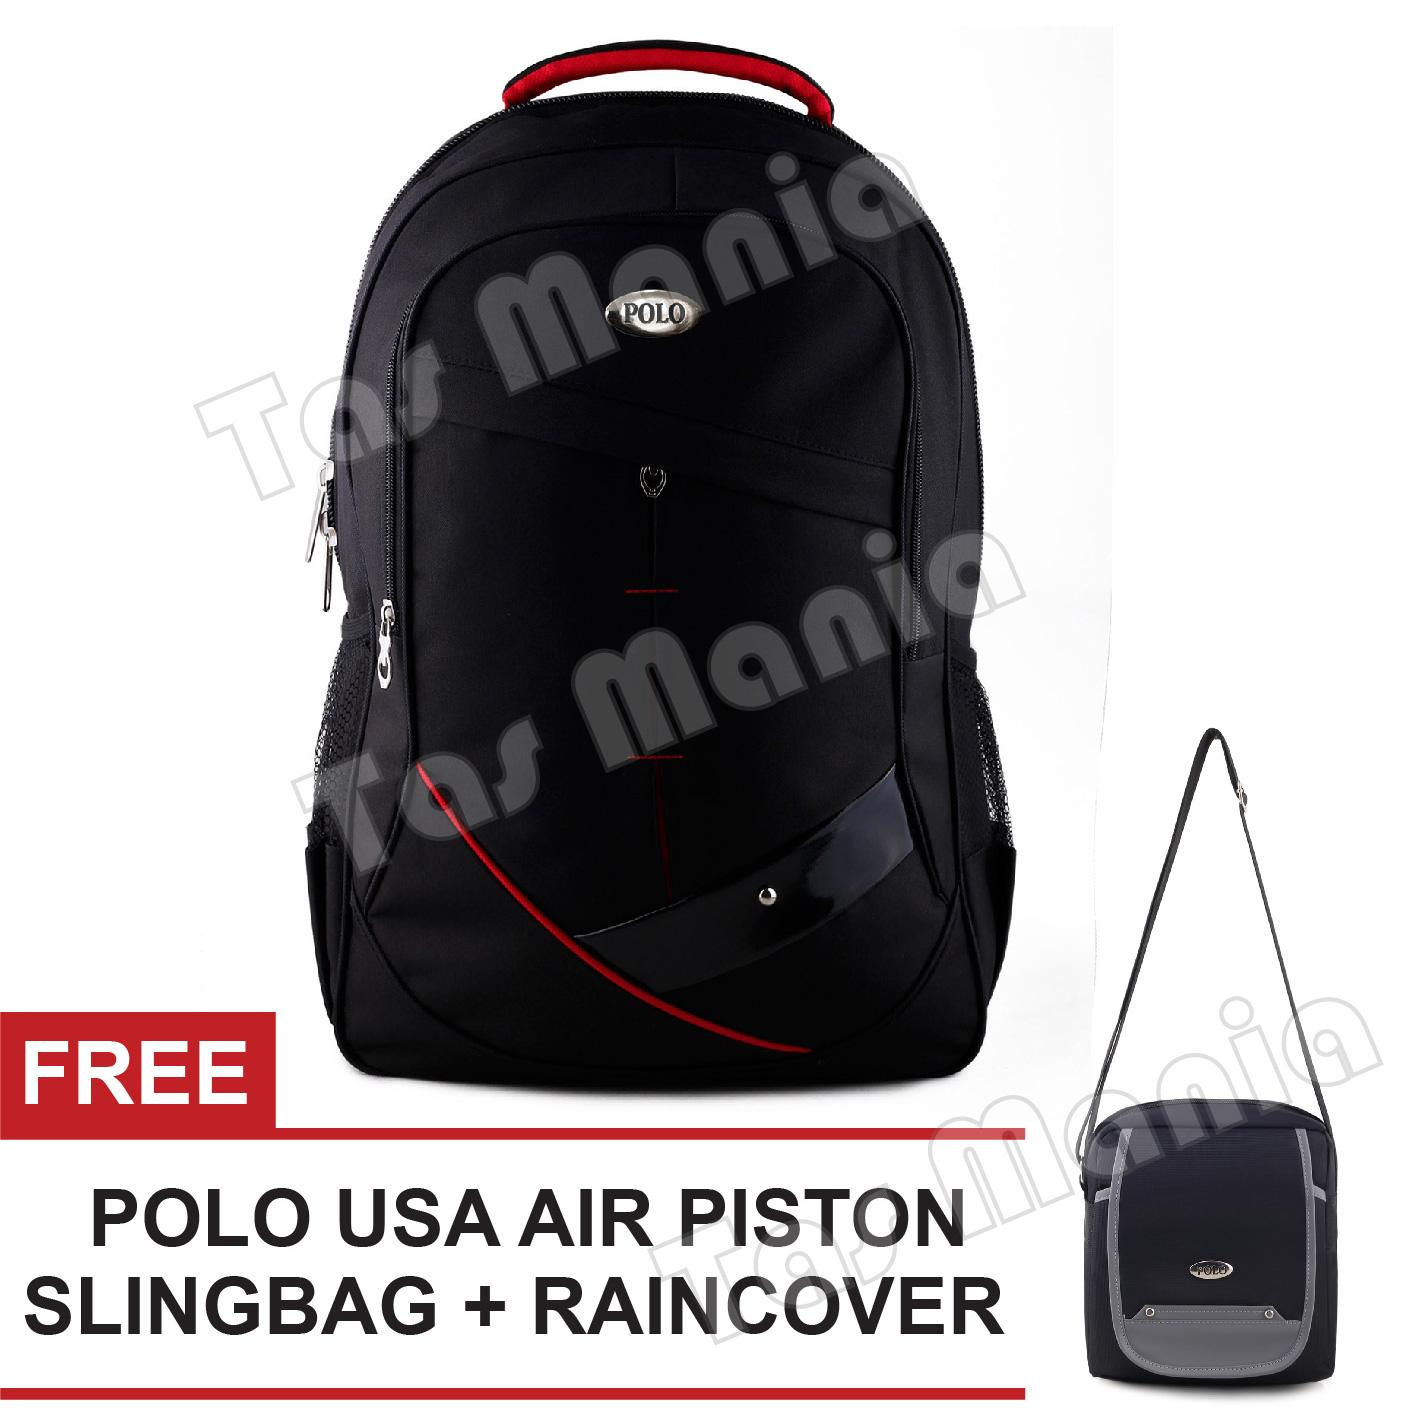 Tas Ransel Polo USA Simple Little America Tas Laptop Backpack - Black + Raincover + FREE